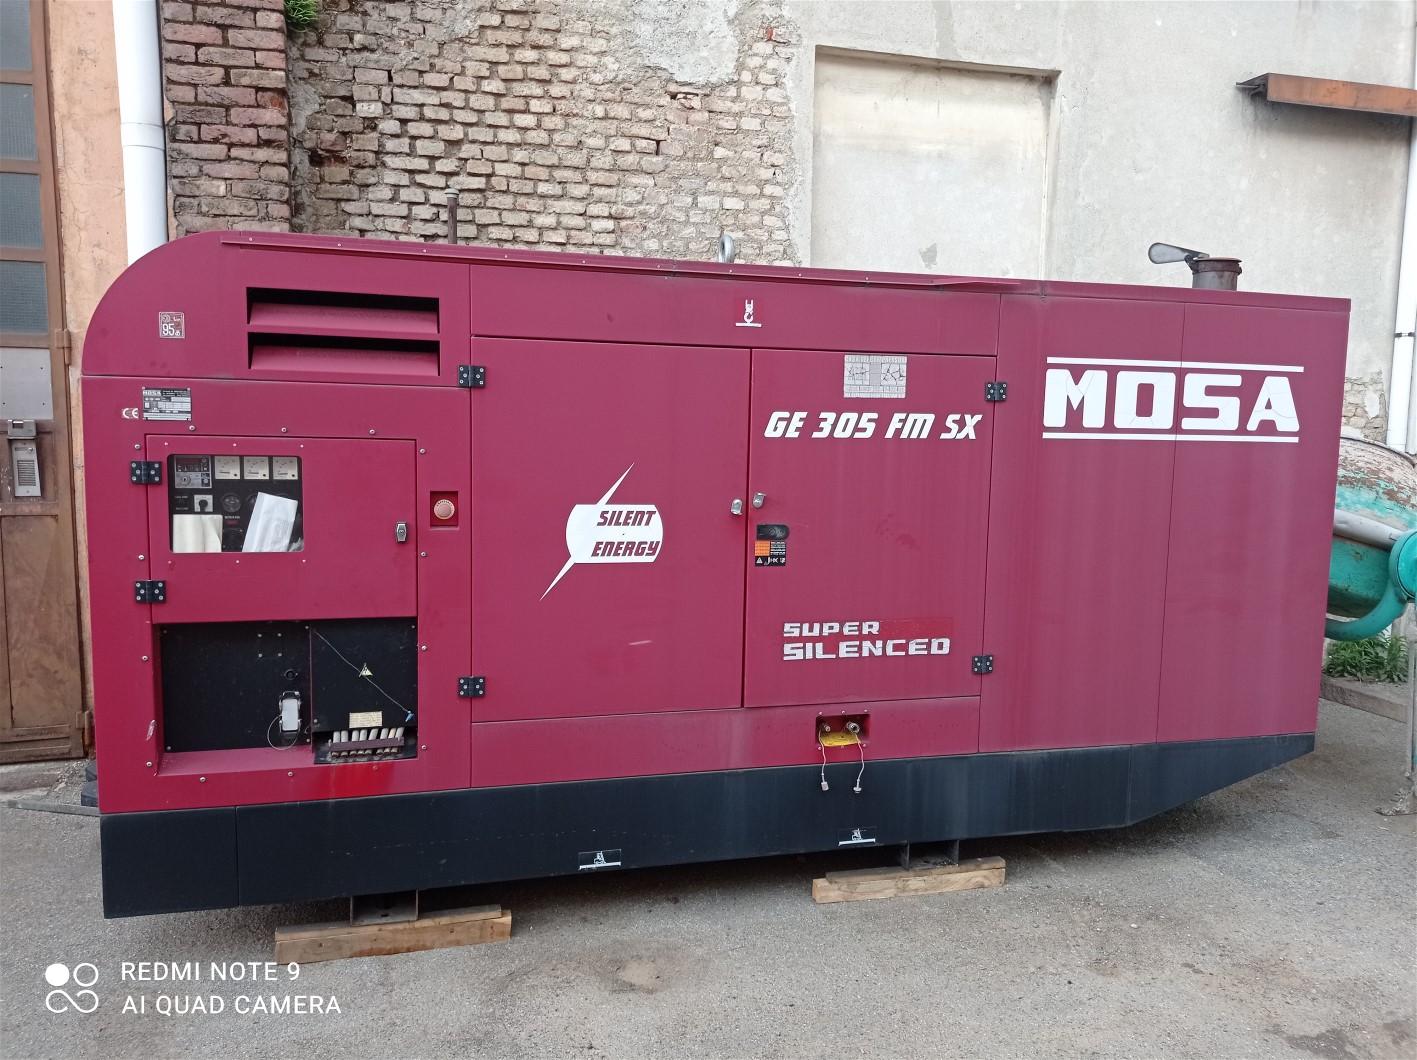 Generatore MOSA GE 305 FMSX in vendita - foto 1